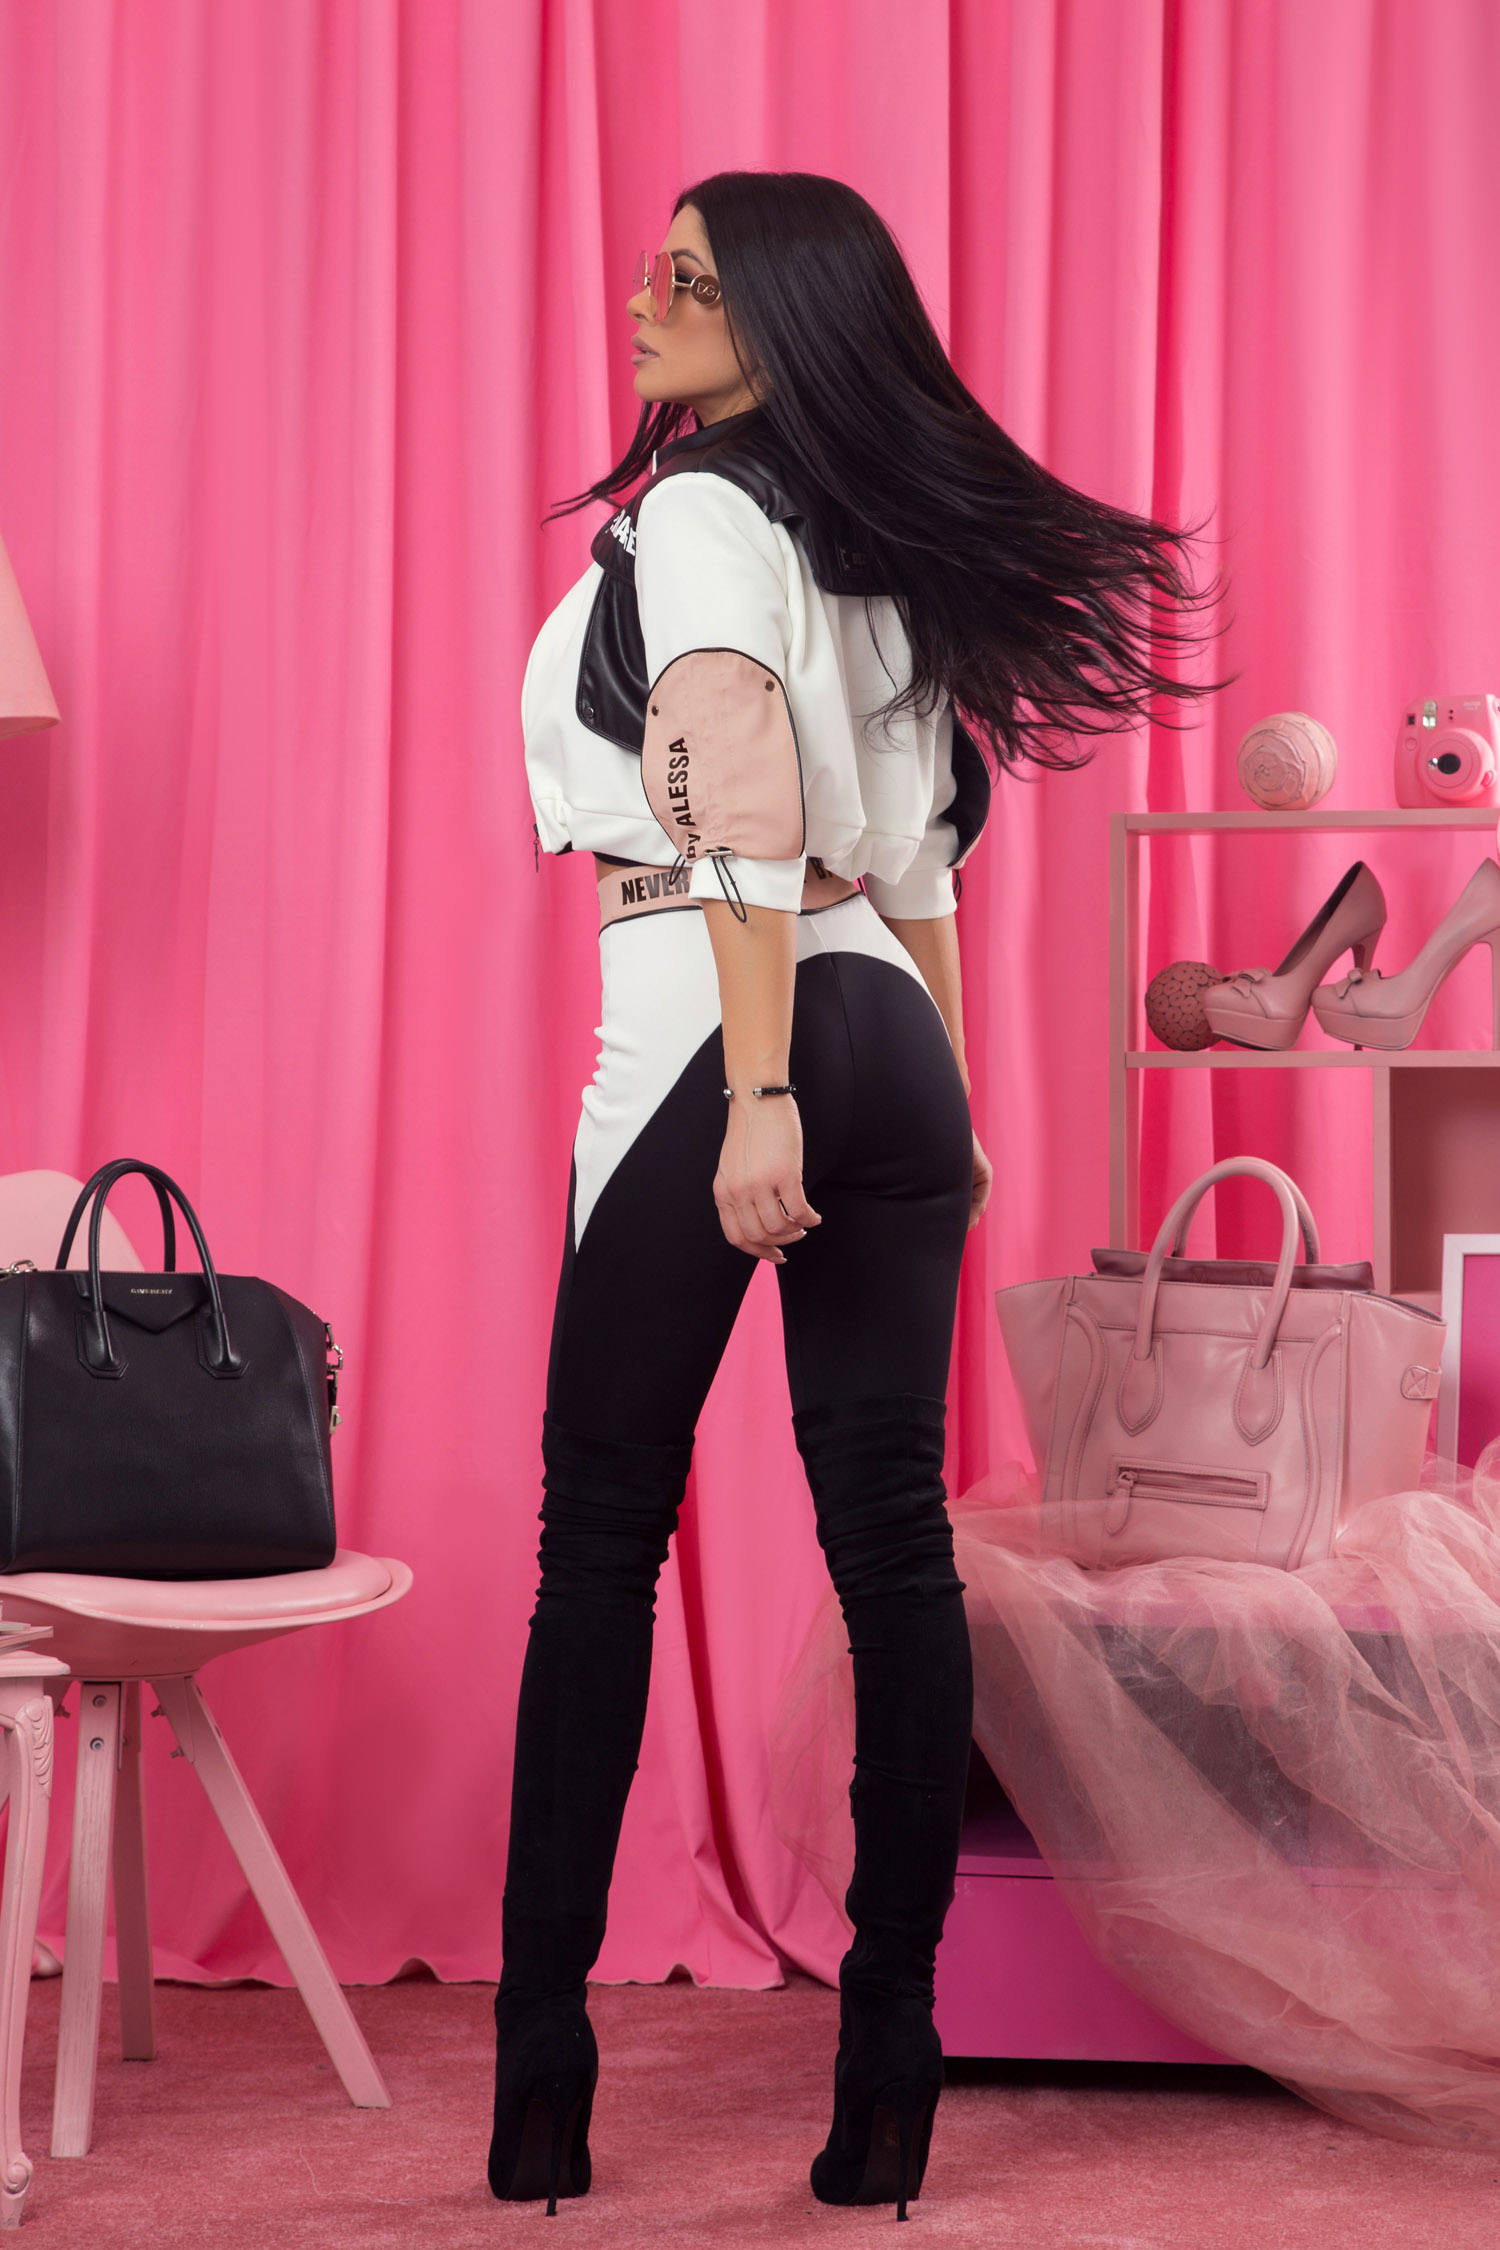 Never average by Alessa панталон - 3 цвята